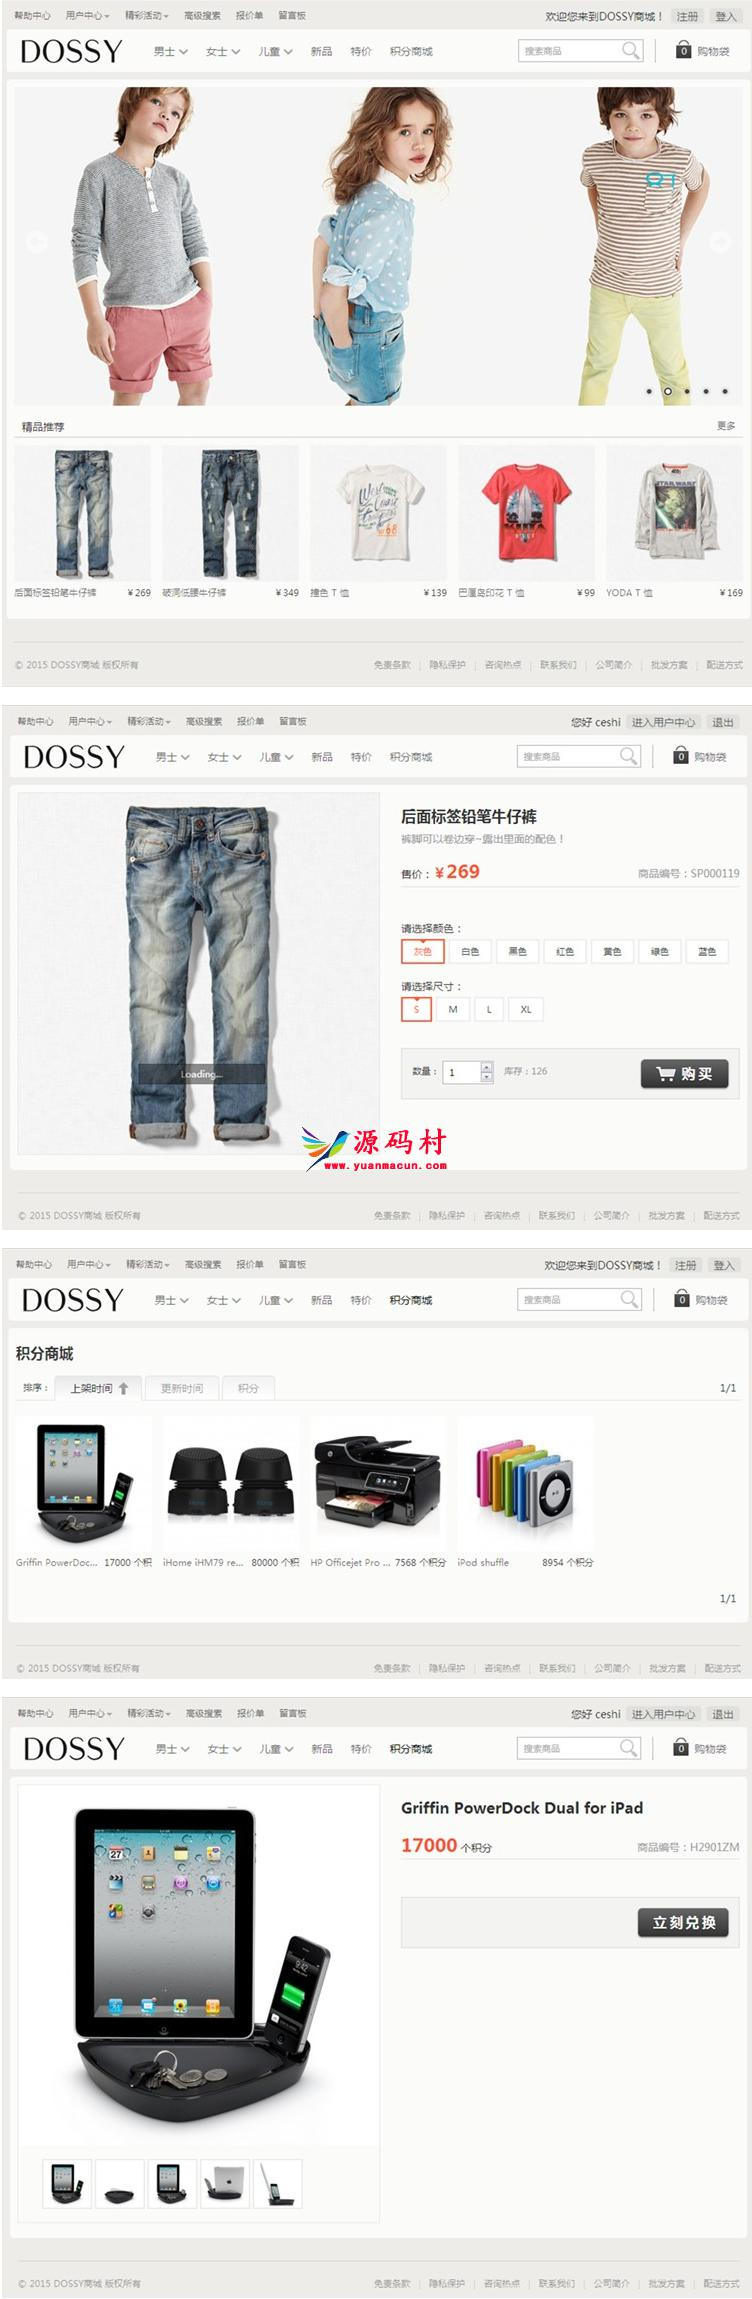 Ecshop仿Dossy简单响应式童装服装商城源码 自适应PC+手机端